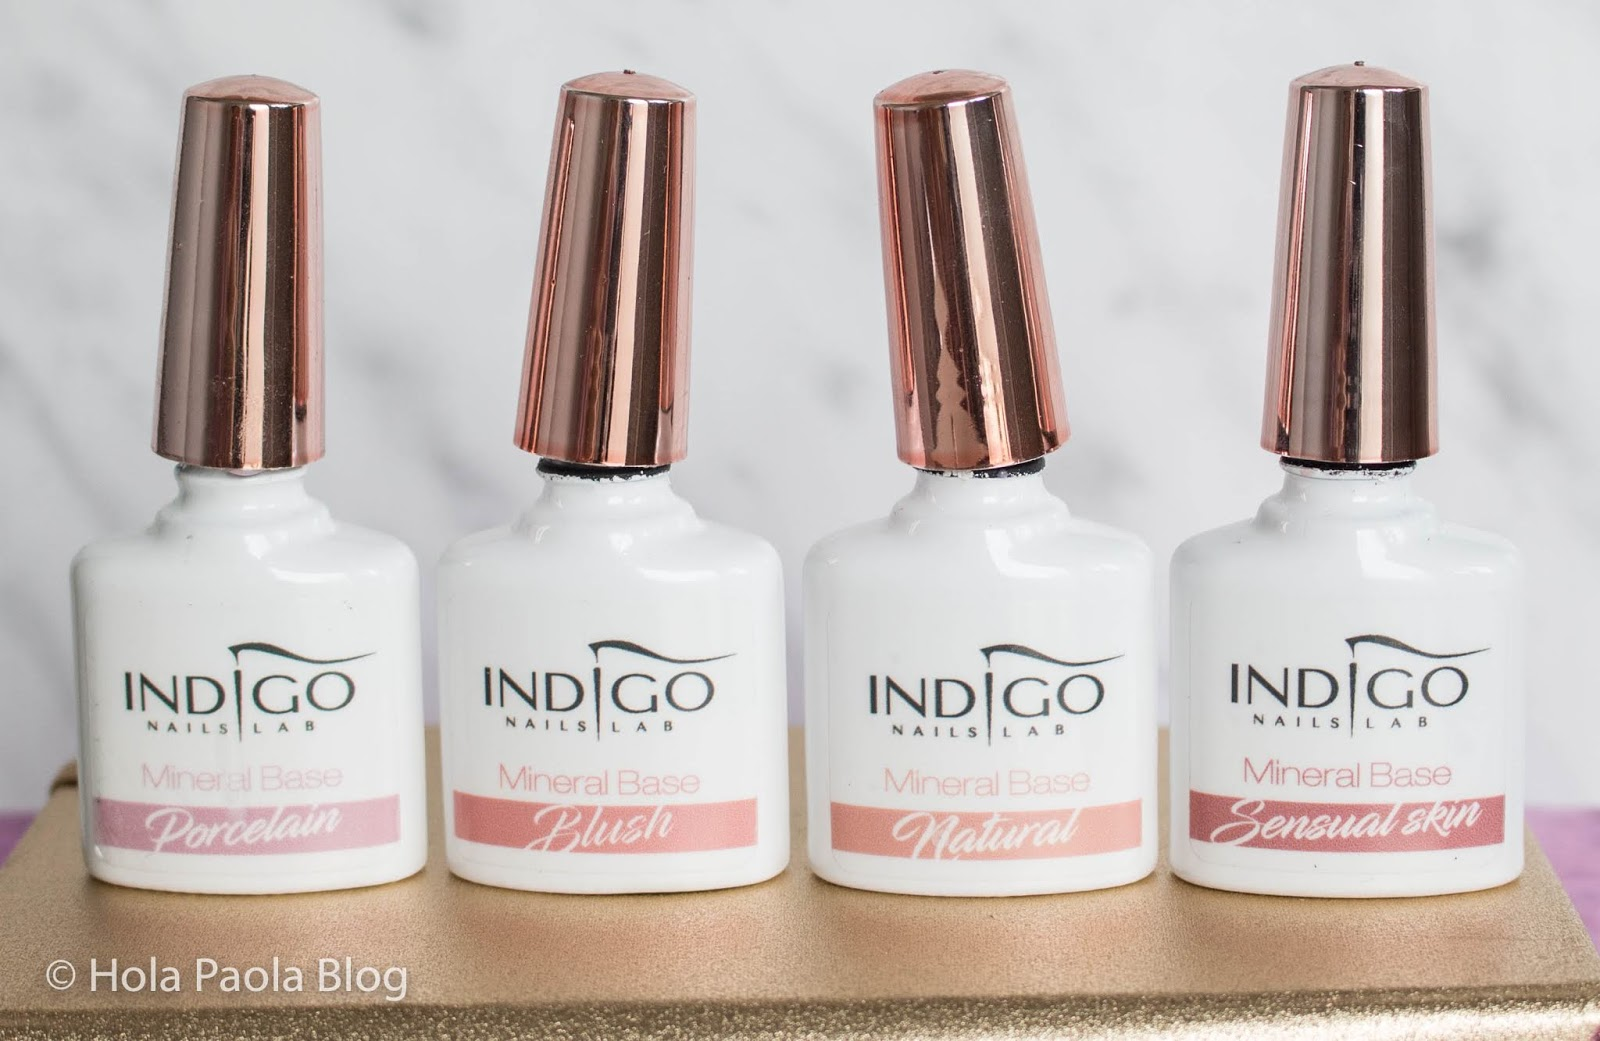 Indigo Mineral Base